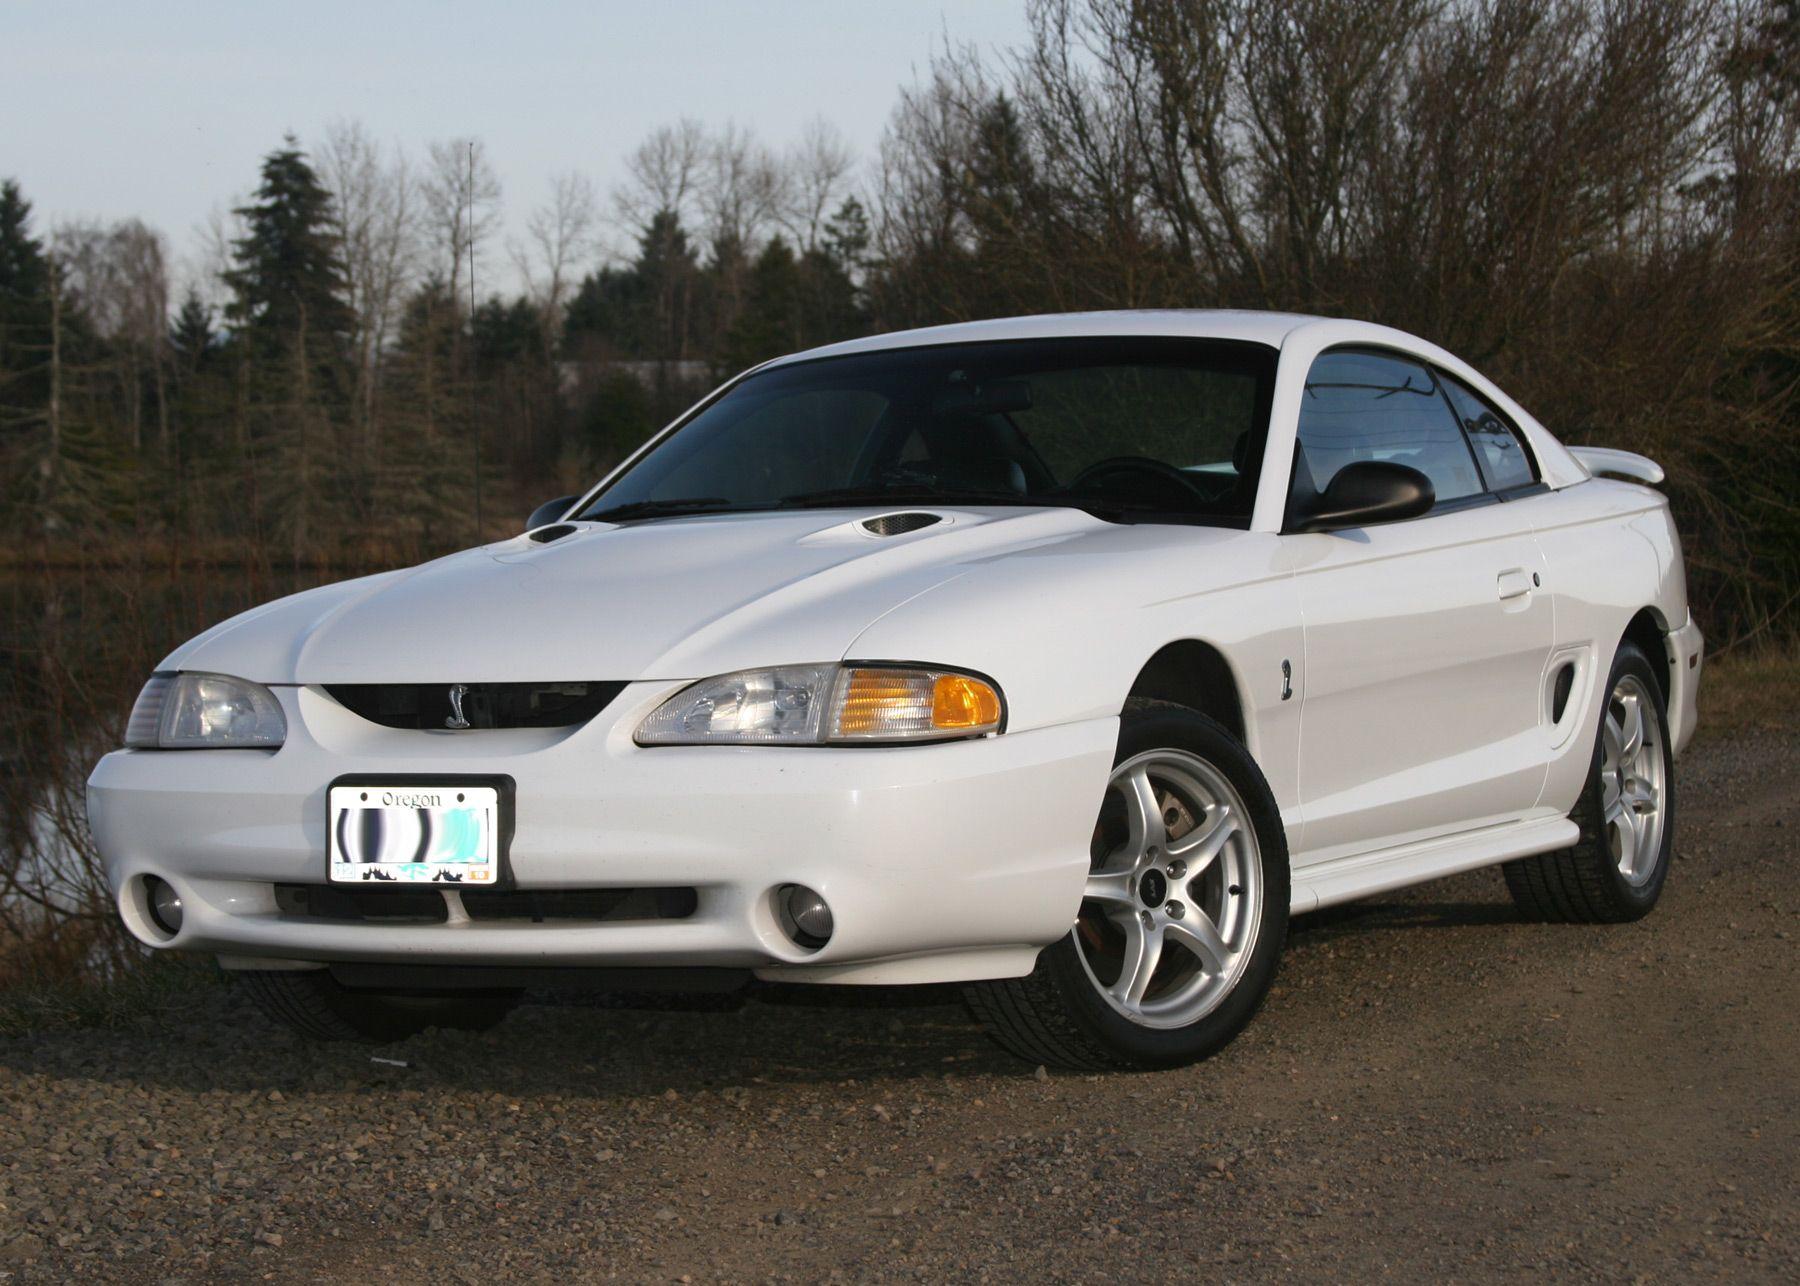 1998 Mustang Cobra White Google Search Mustang Cobra Mustang Car